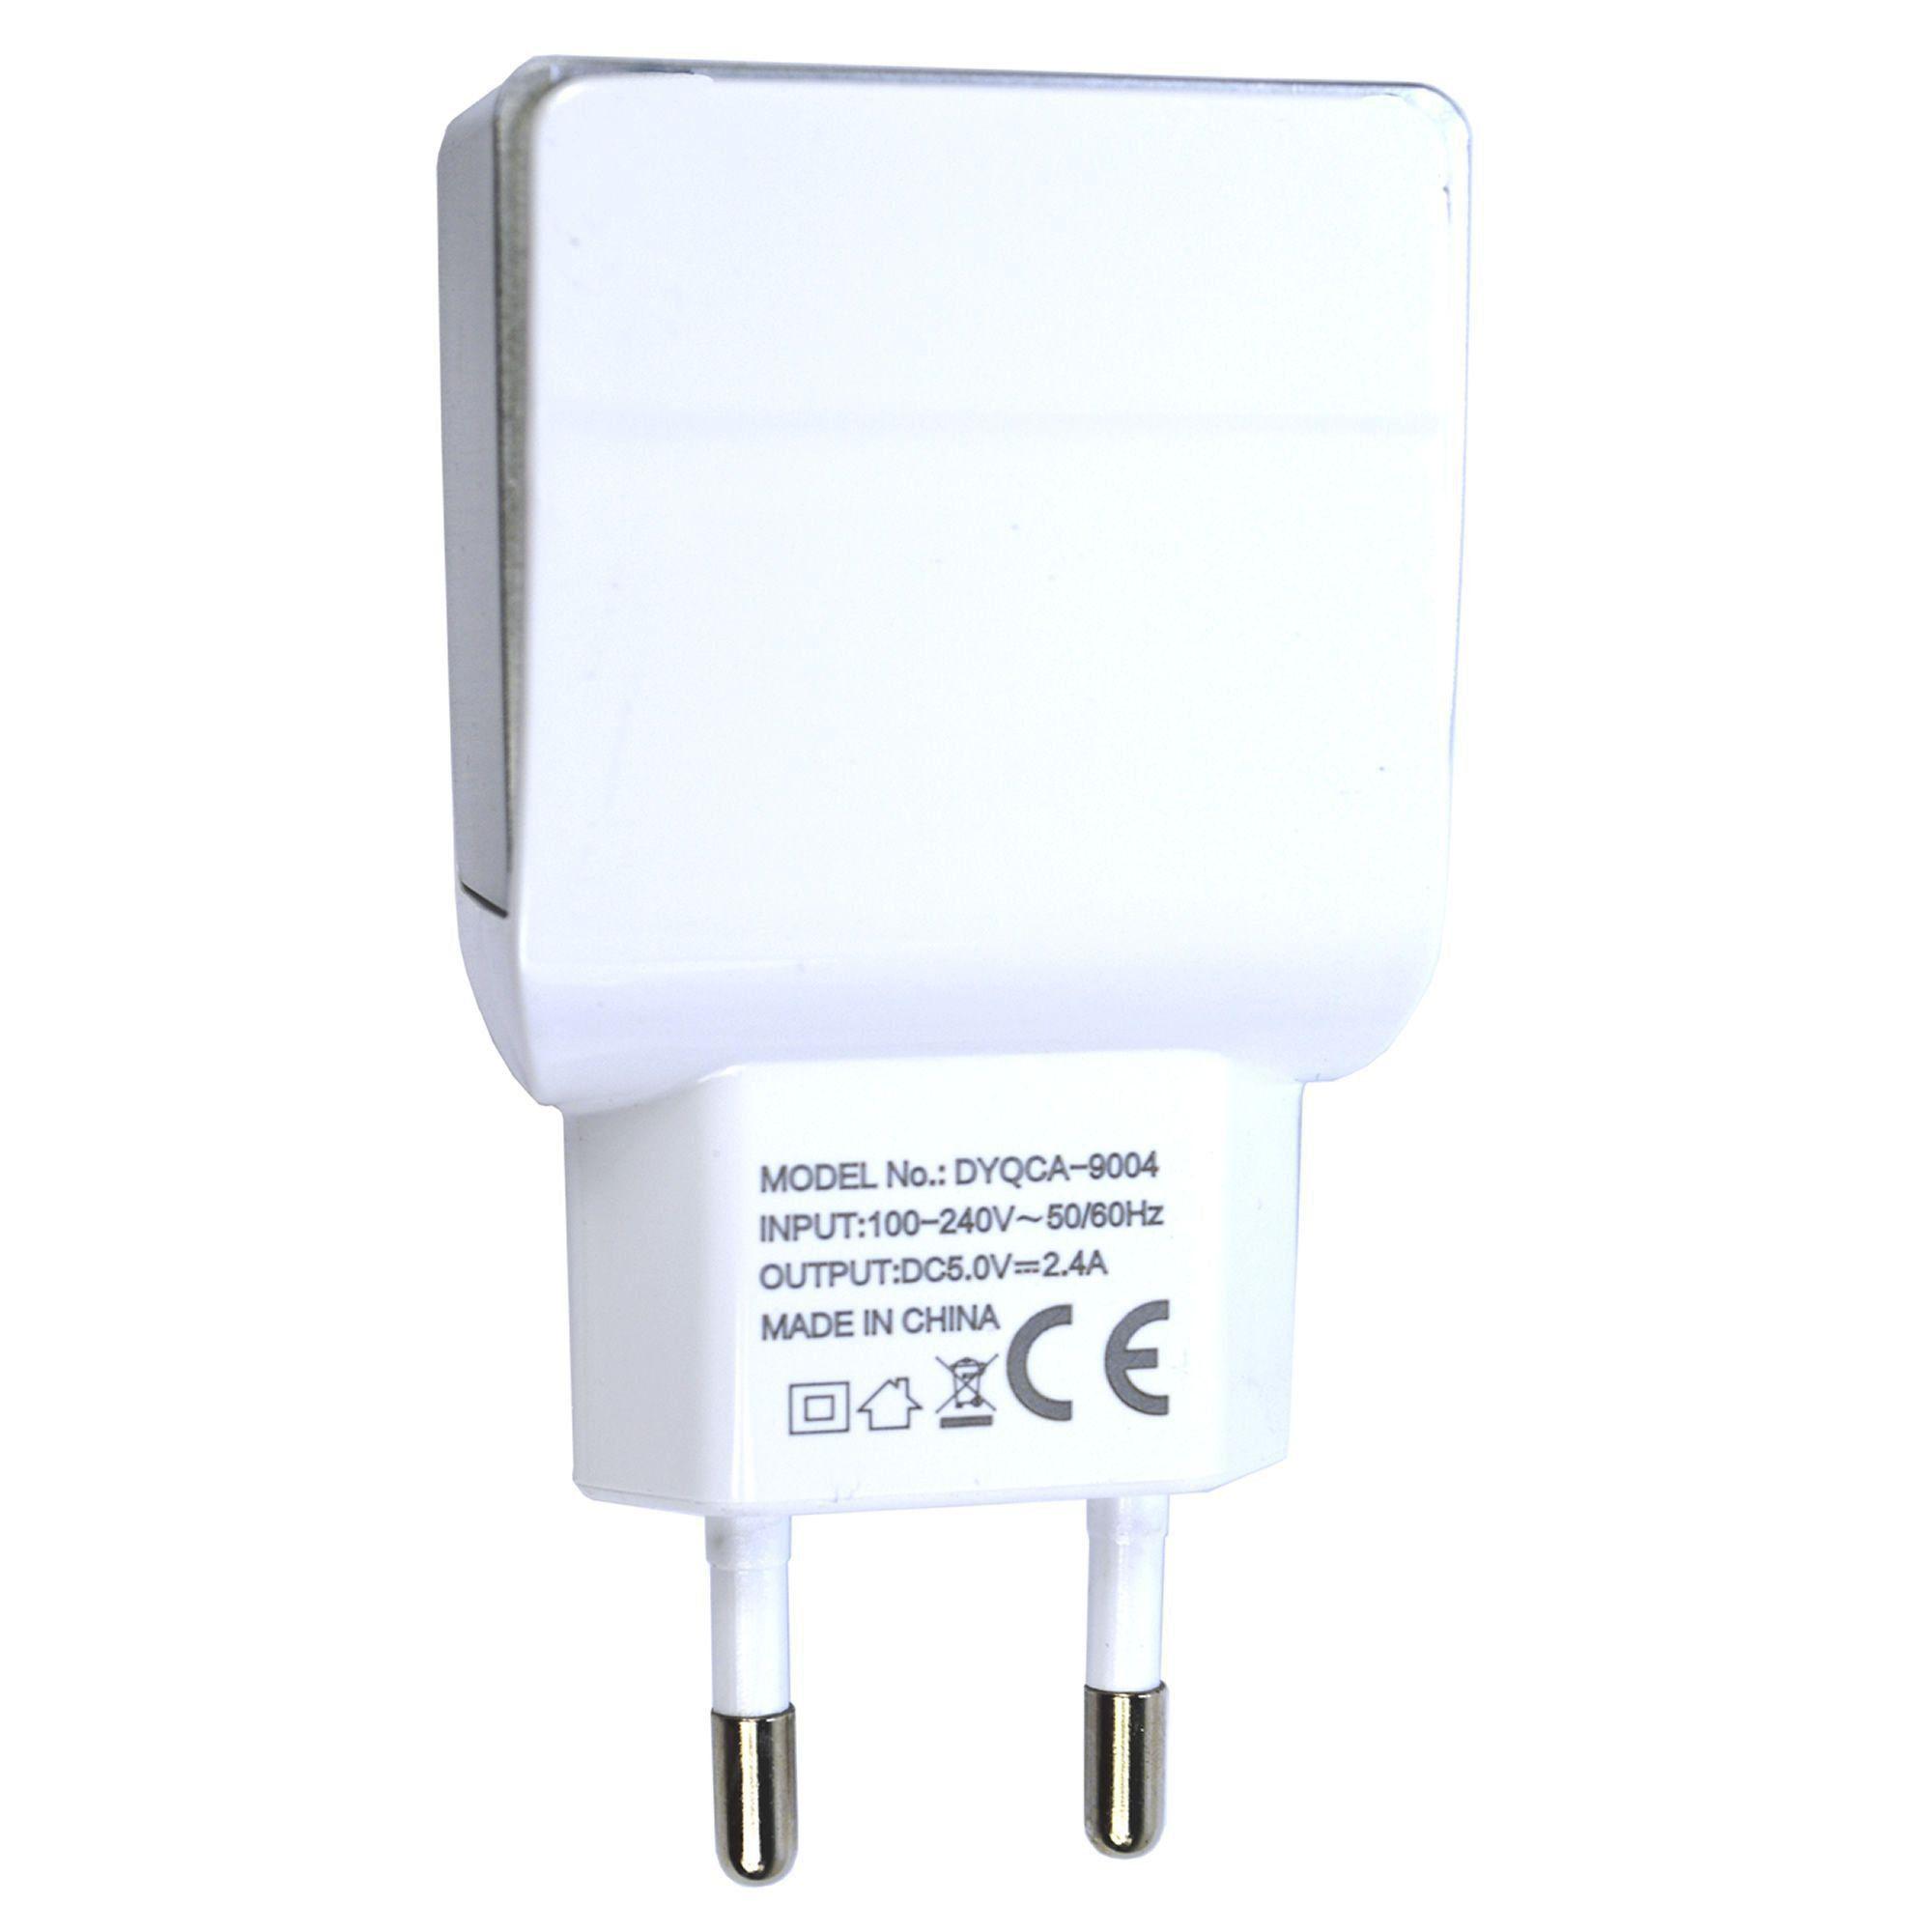 Carregador De Celular Universal Parede 2 USB bivolt 2.4A CBRN05291